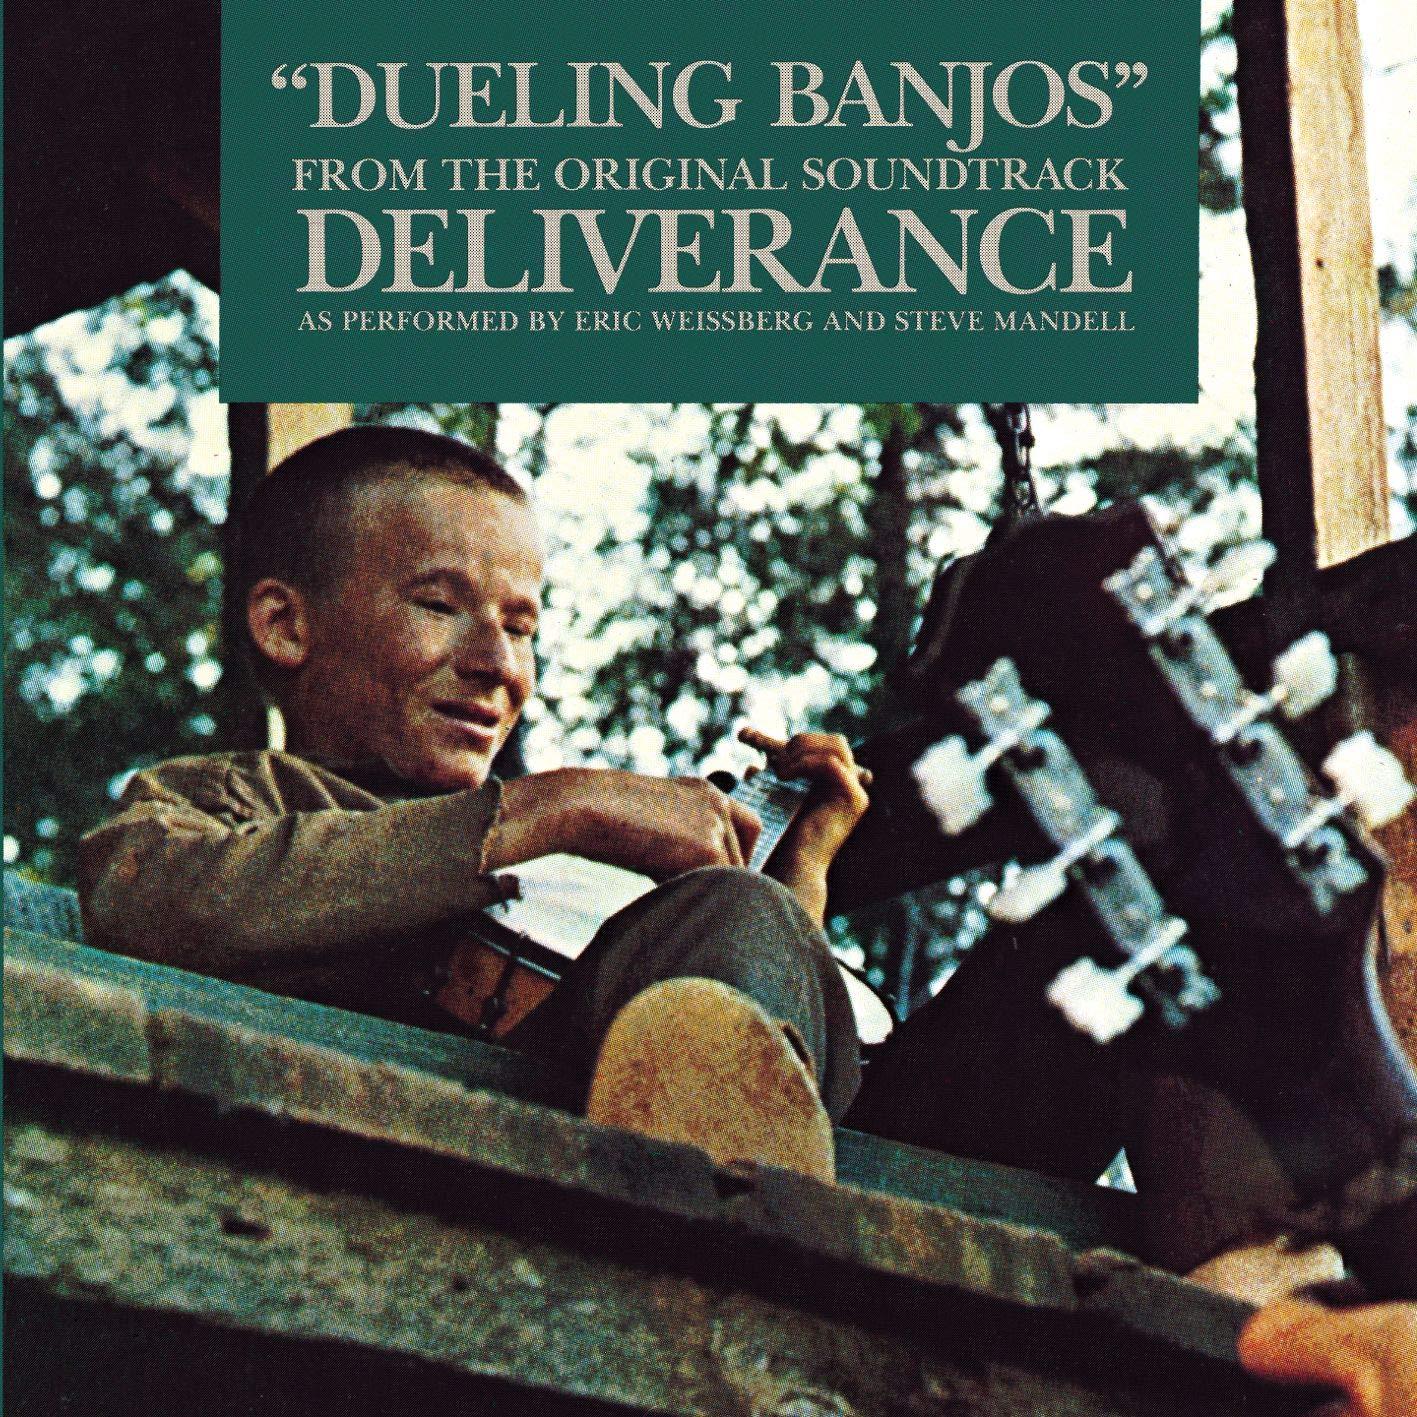 Image result for eric weissberg dueling banjo images